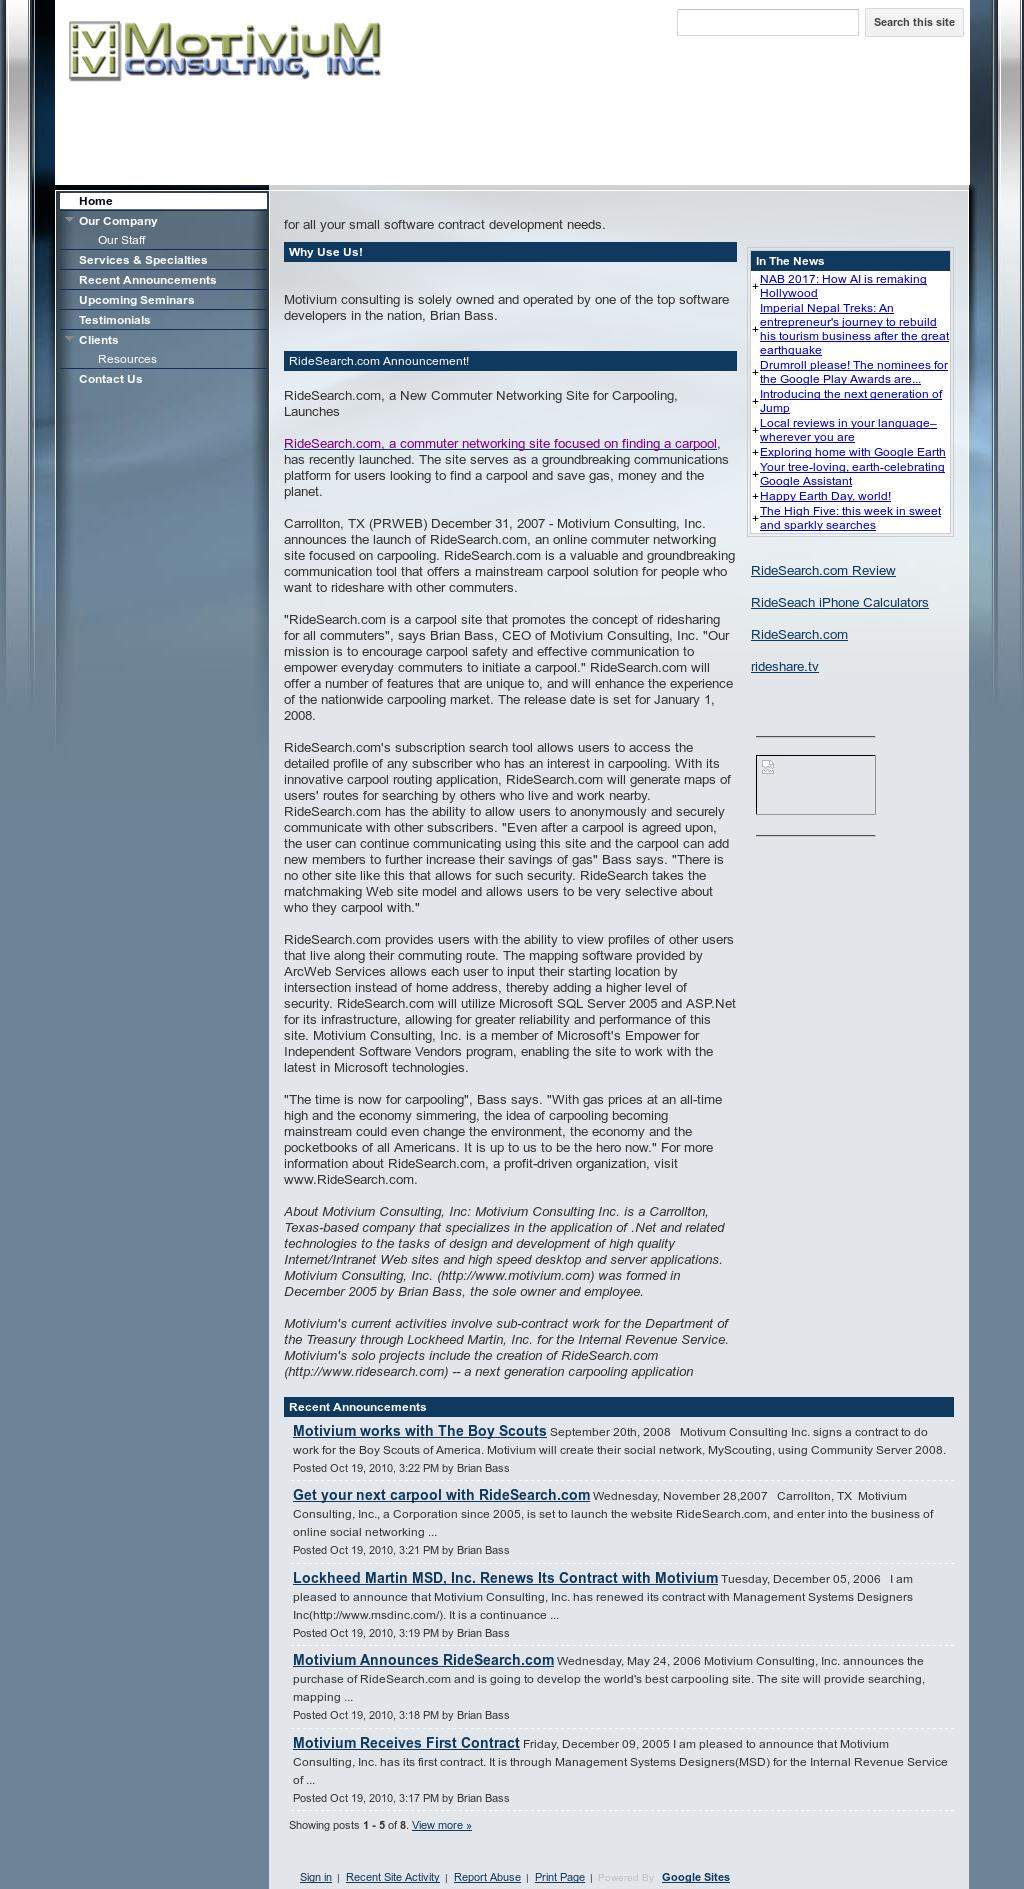 Motivium Consulting Competitors, Revenue and Employees - Owler